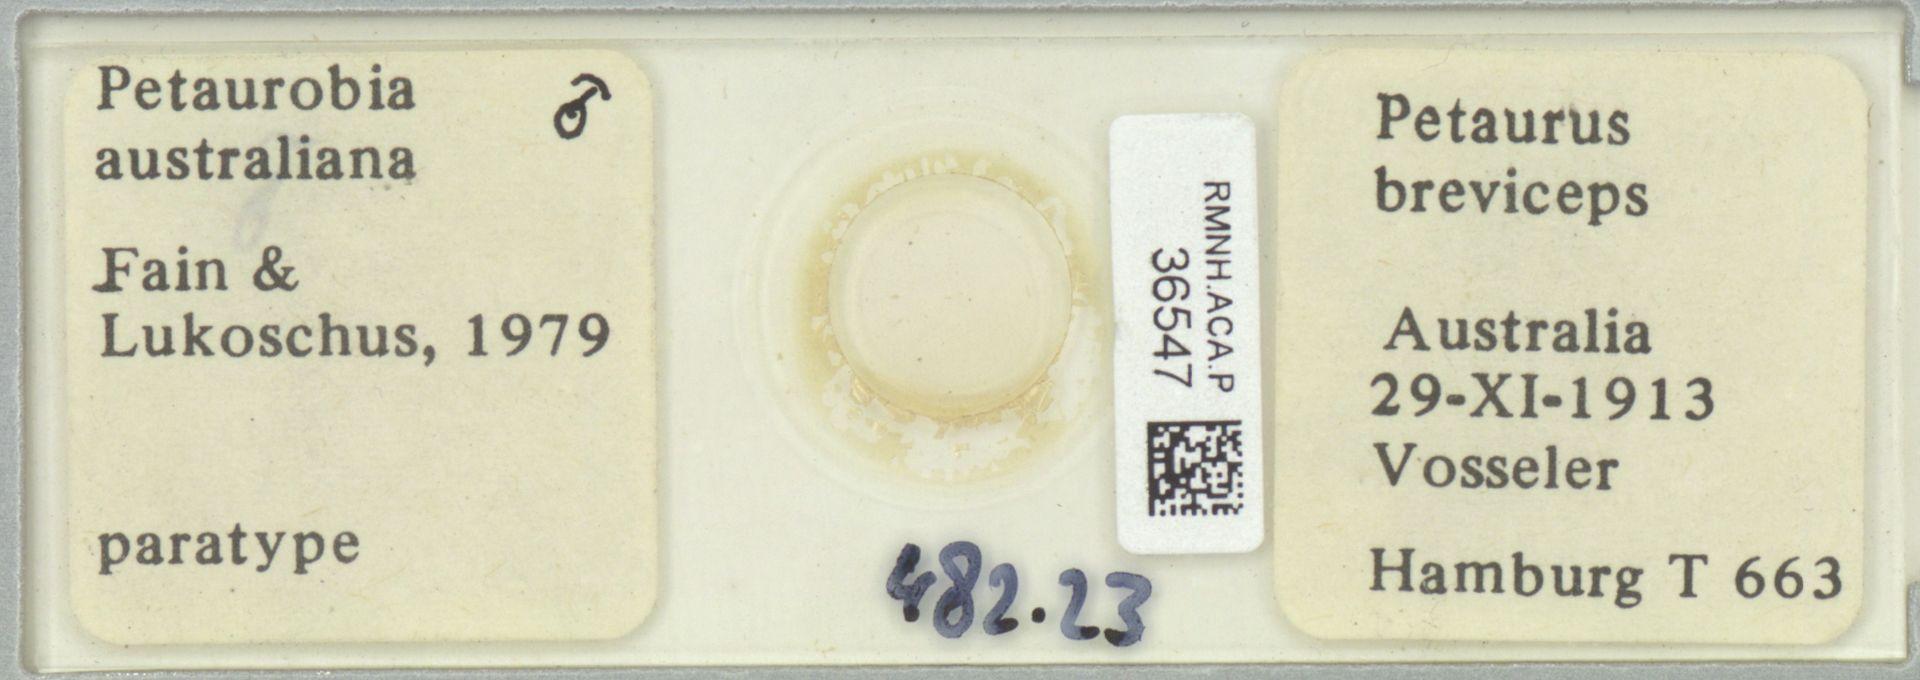 RMNH.ACA.P.36547 | Petaurobia australiana Fain & Lukoschus, 1979